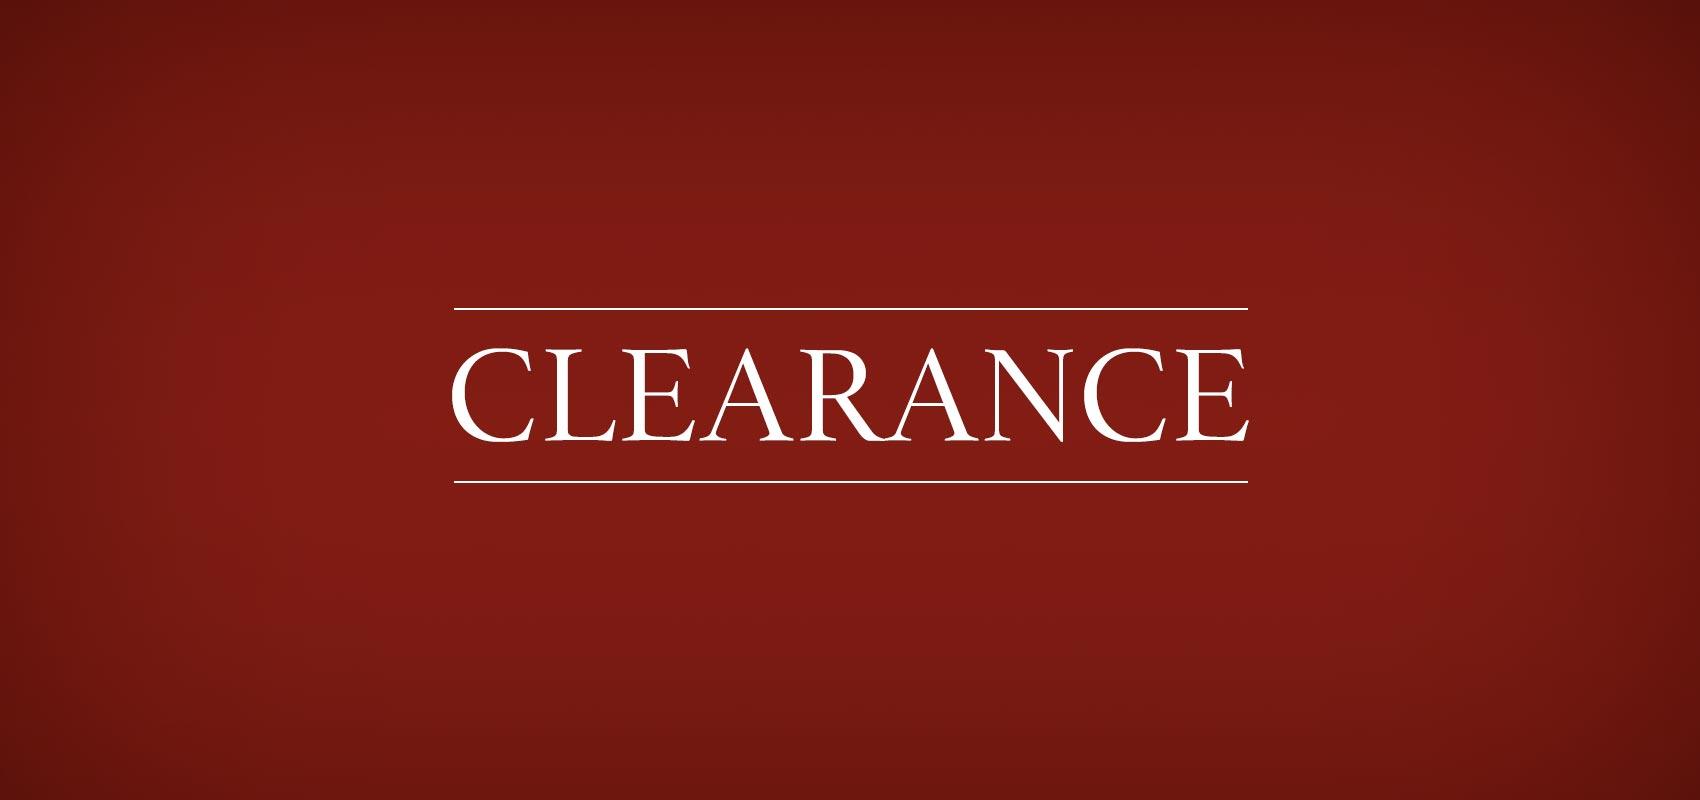 Charles Tyrwhitt clearance